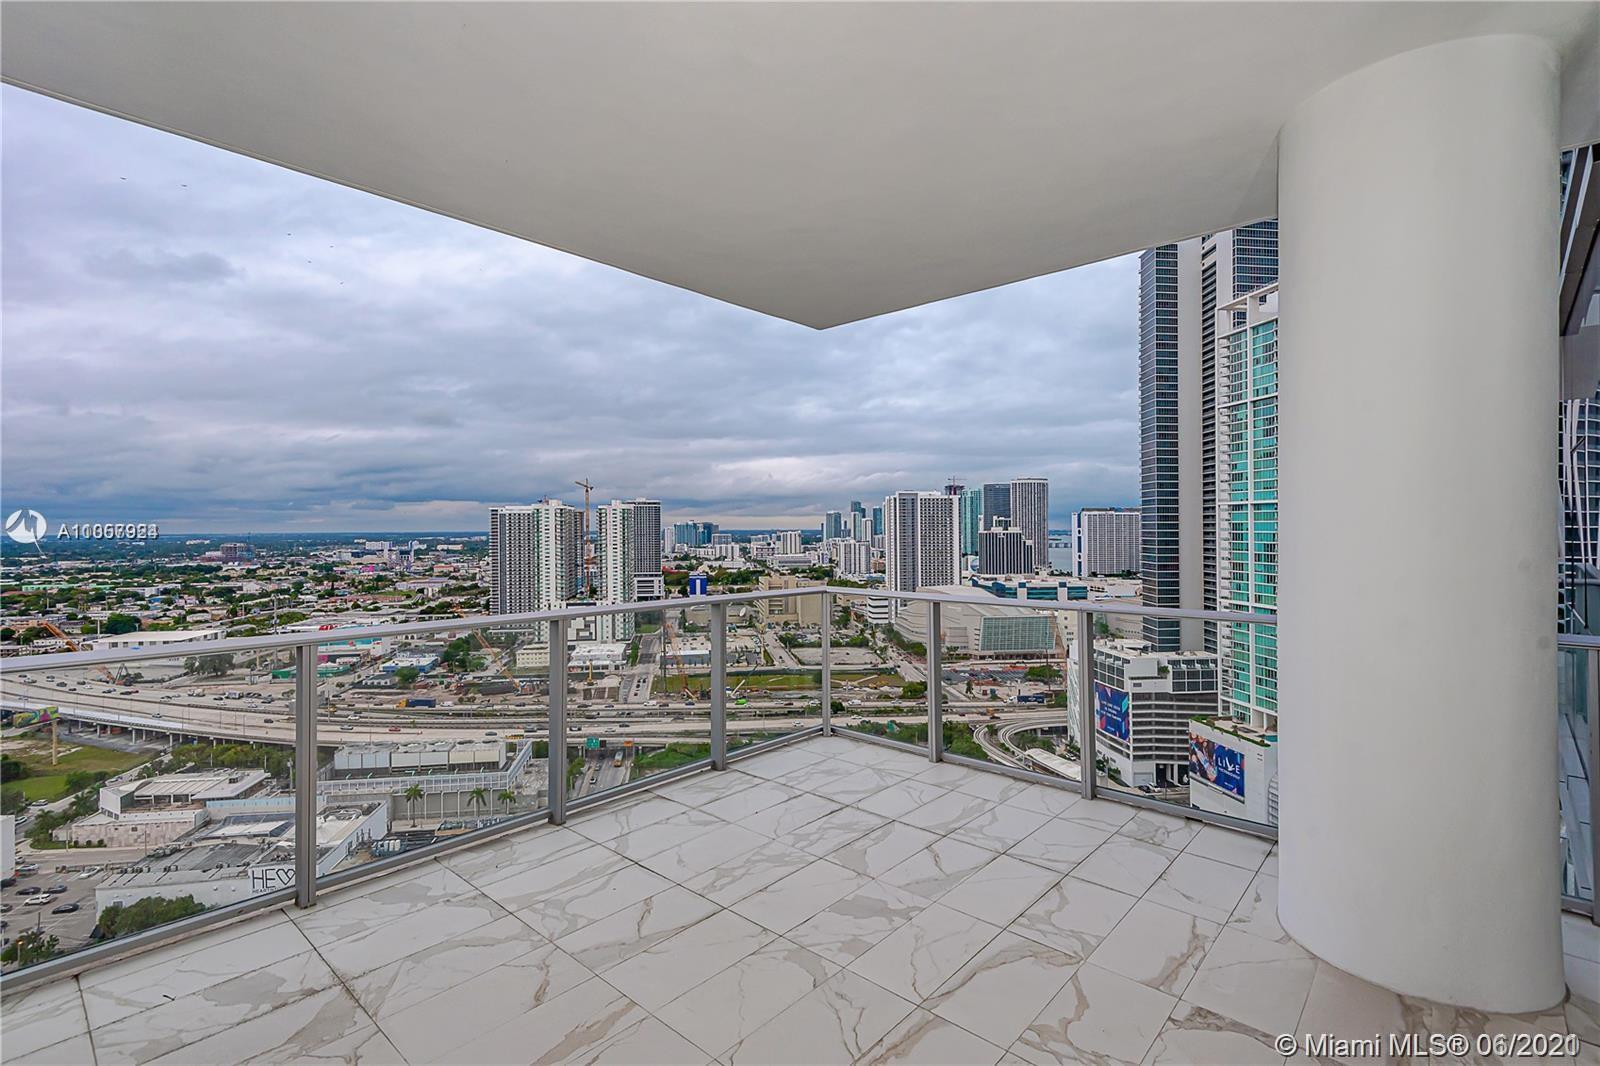 Paramount Miami Worldcenter #2600 - 851 NE 1st Ave #2600, Miami, FL 33132